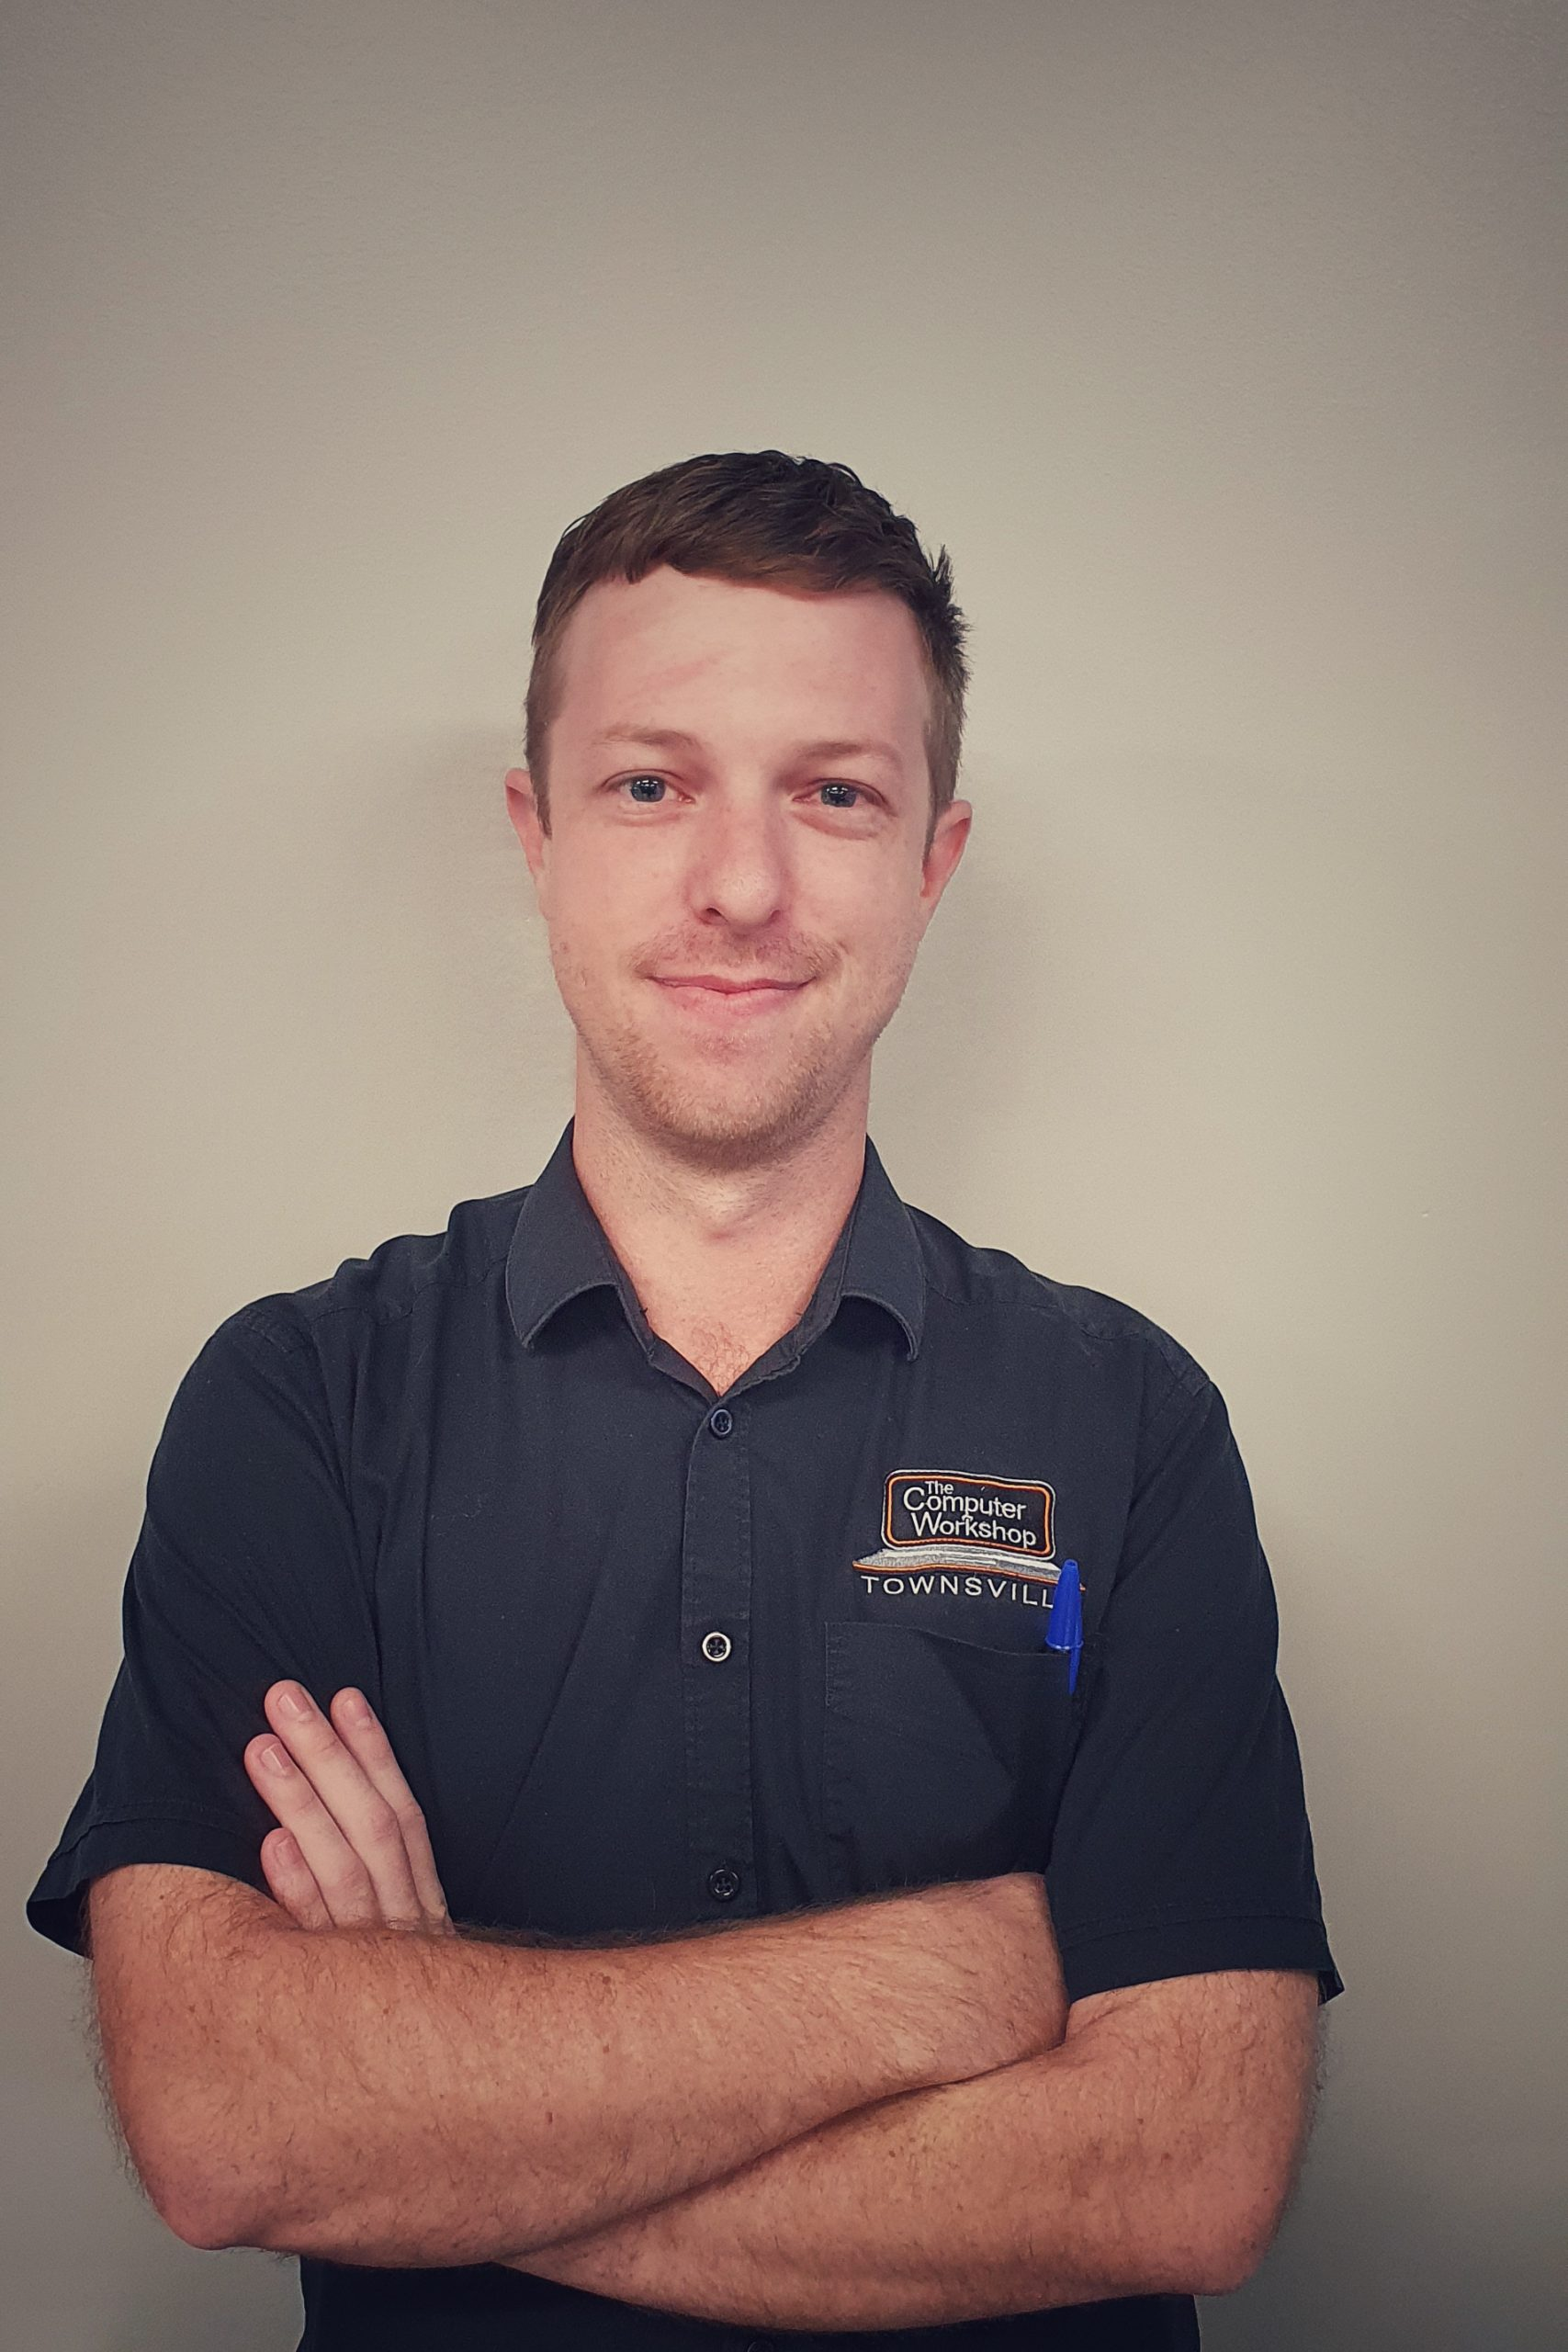 Jordan Wilson - Systems Engineer